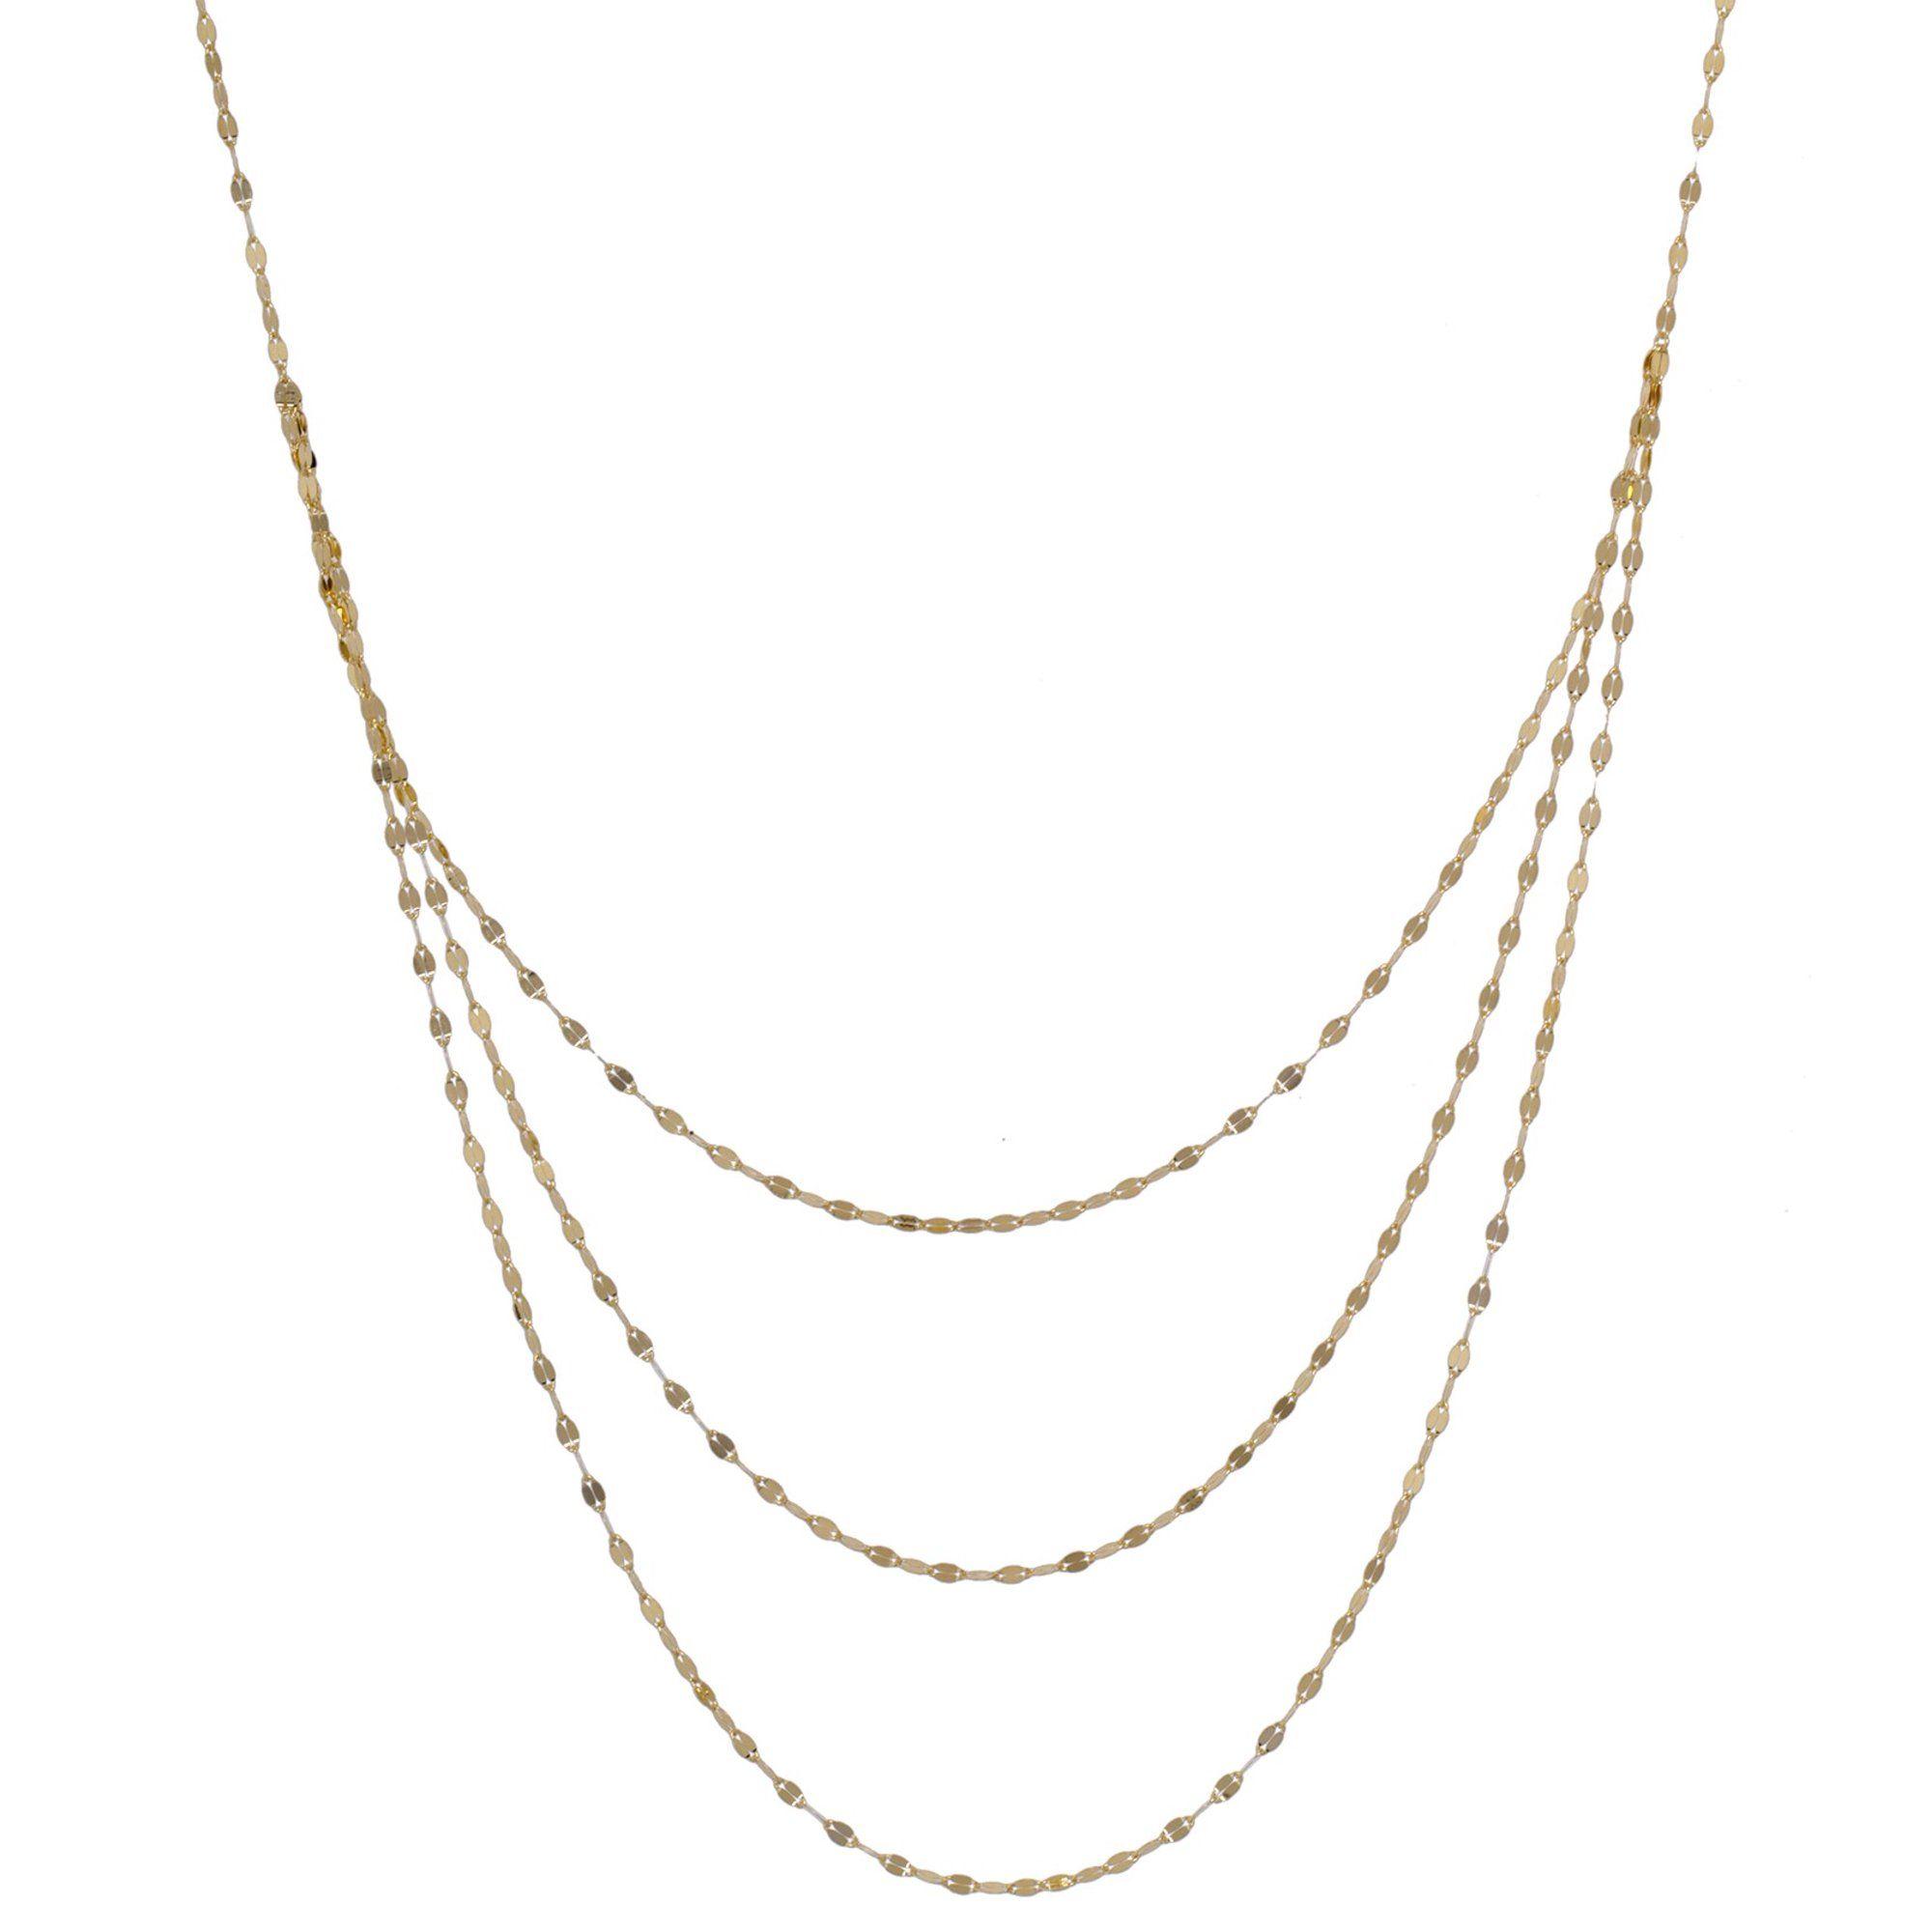 Brilliance Fine Jewelry 10k Yellow Gold Layered Three Strand Mirror Chain Necklace Walmart Com Chain Necklace Necklace Walmart Gold Layers